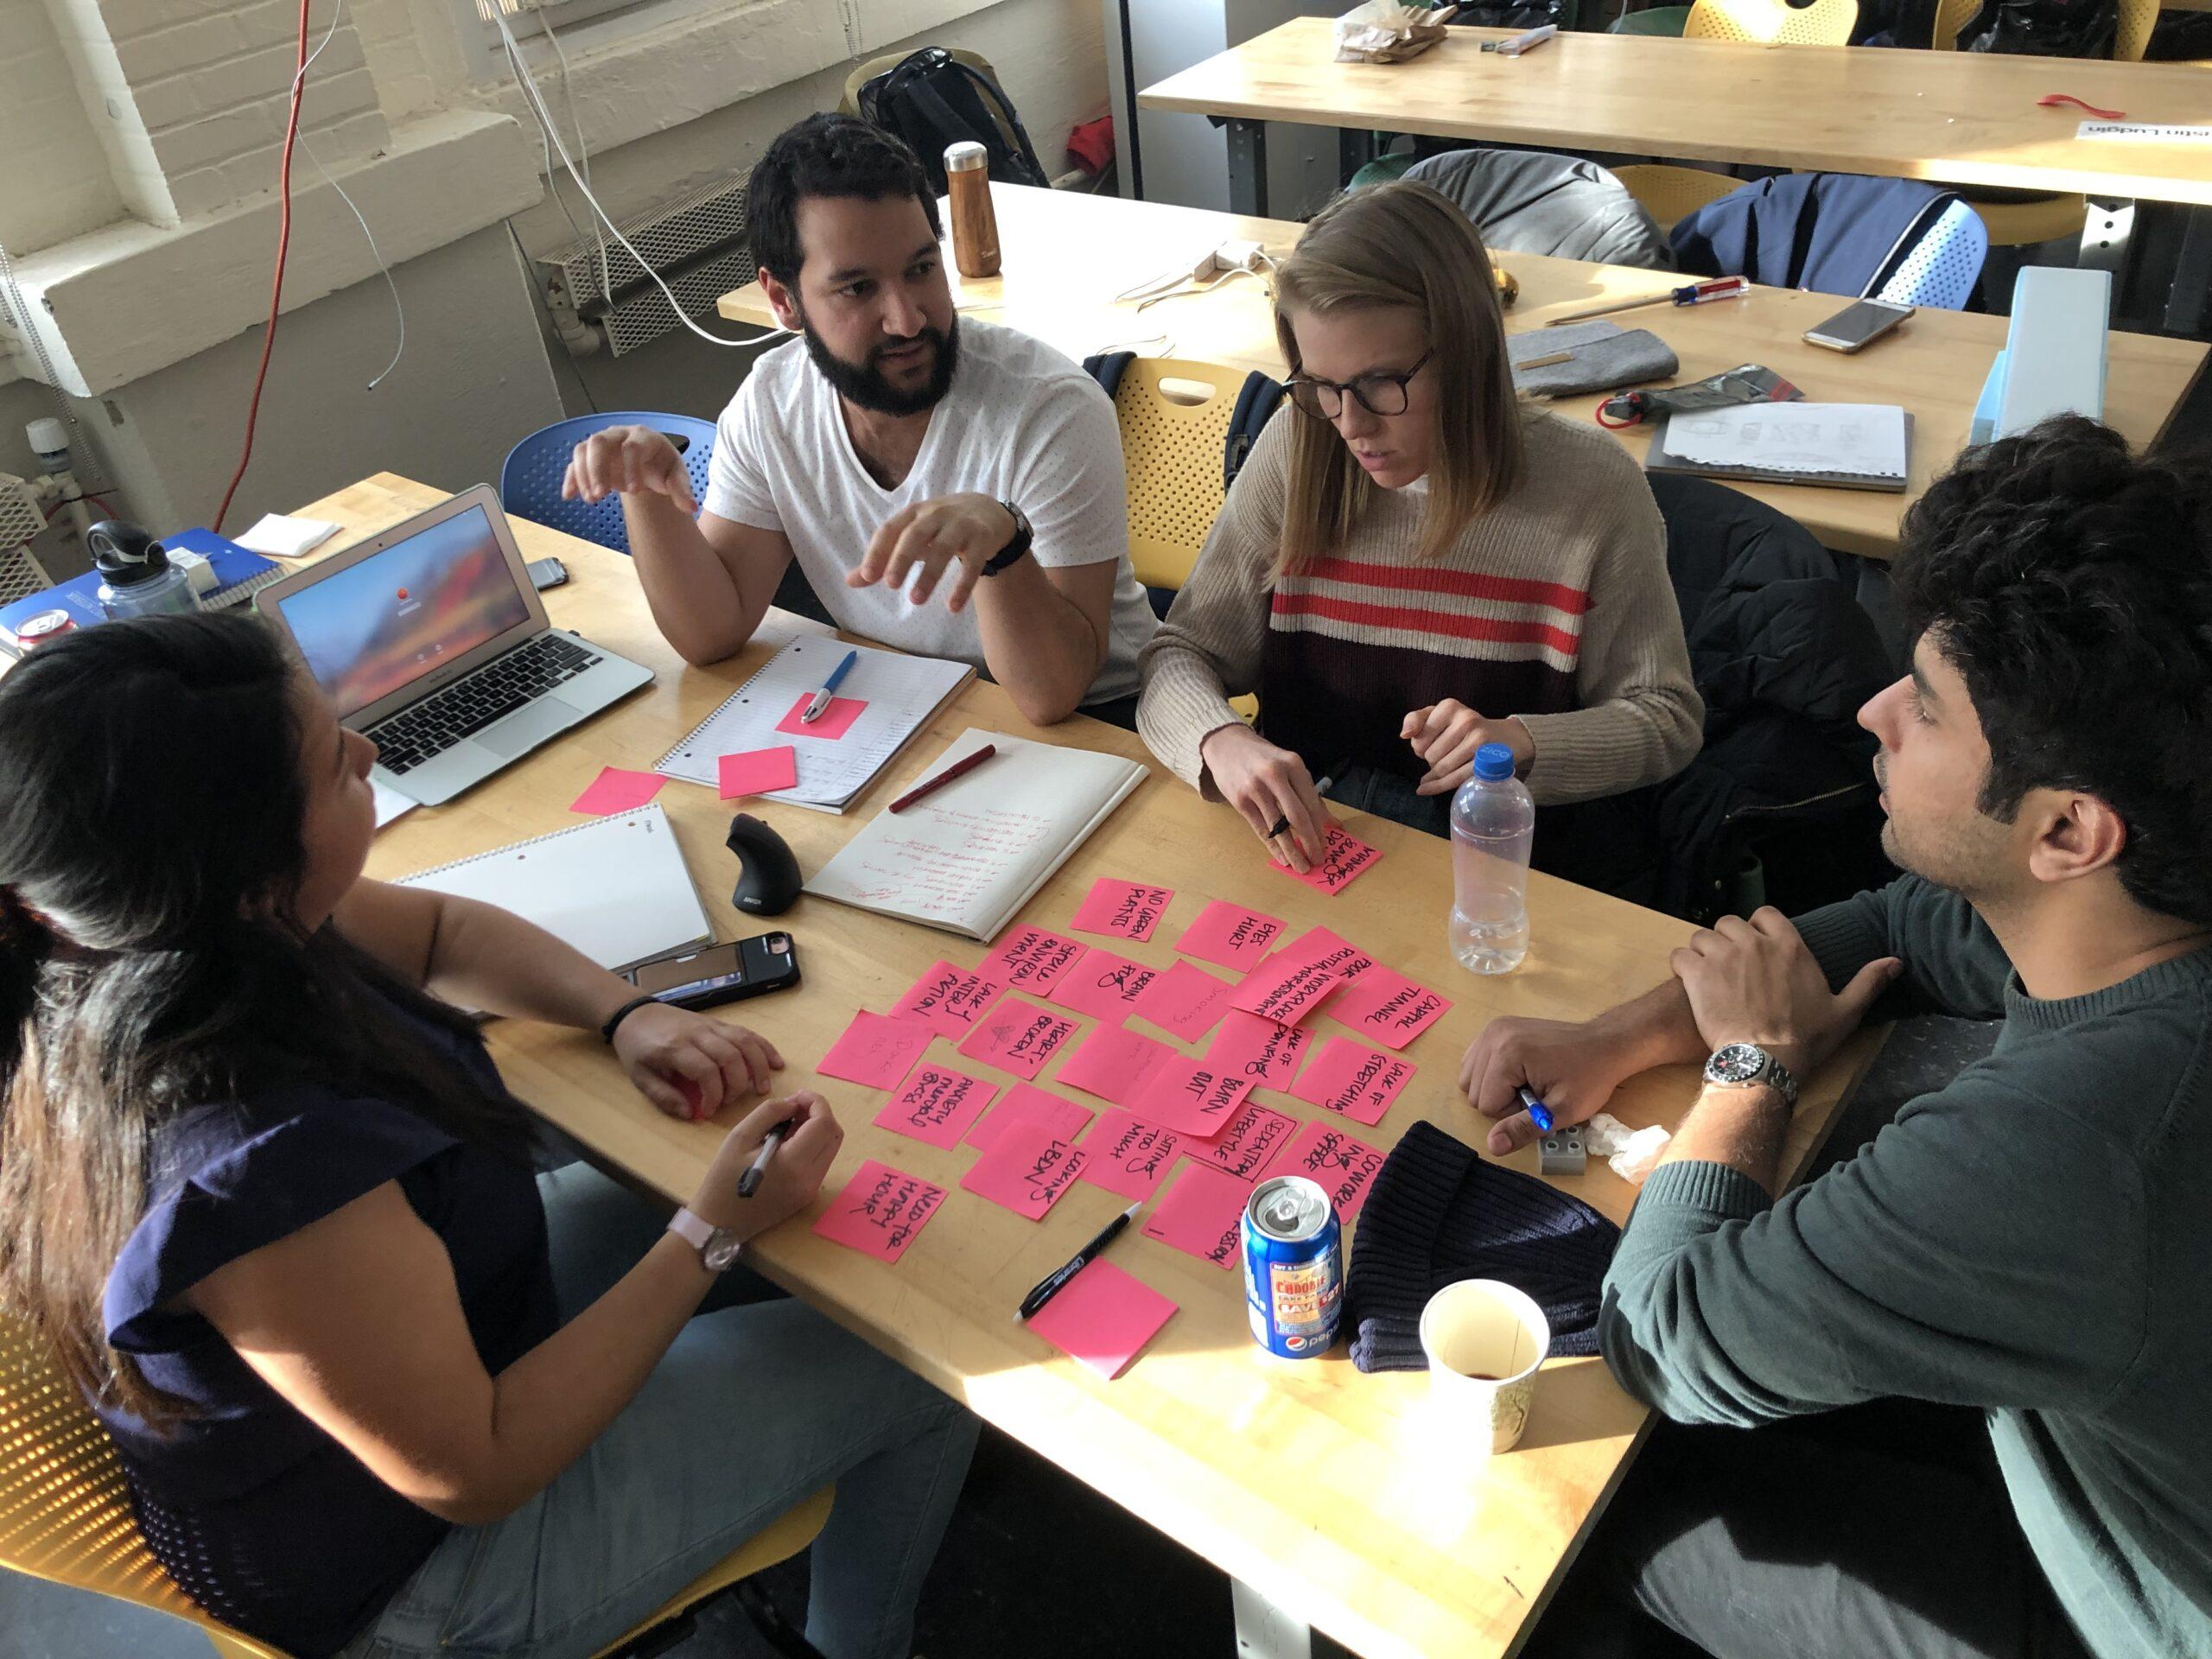 Team TBD processing ideas on post its